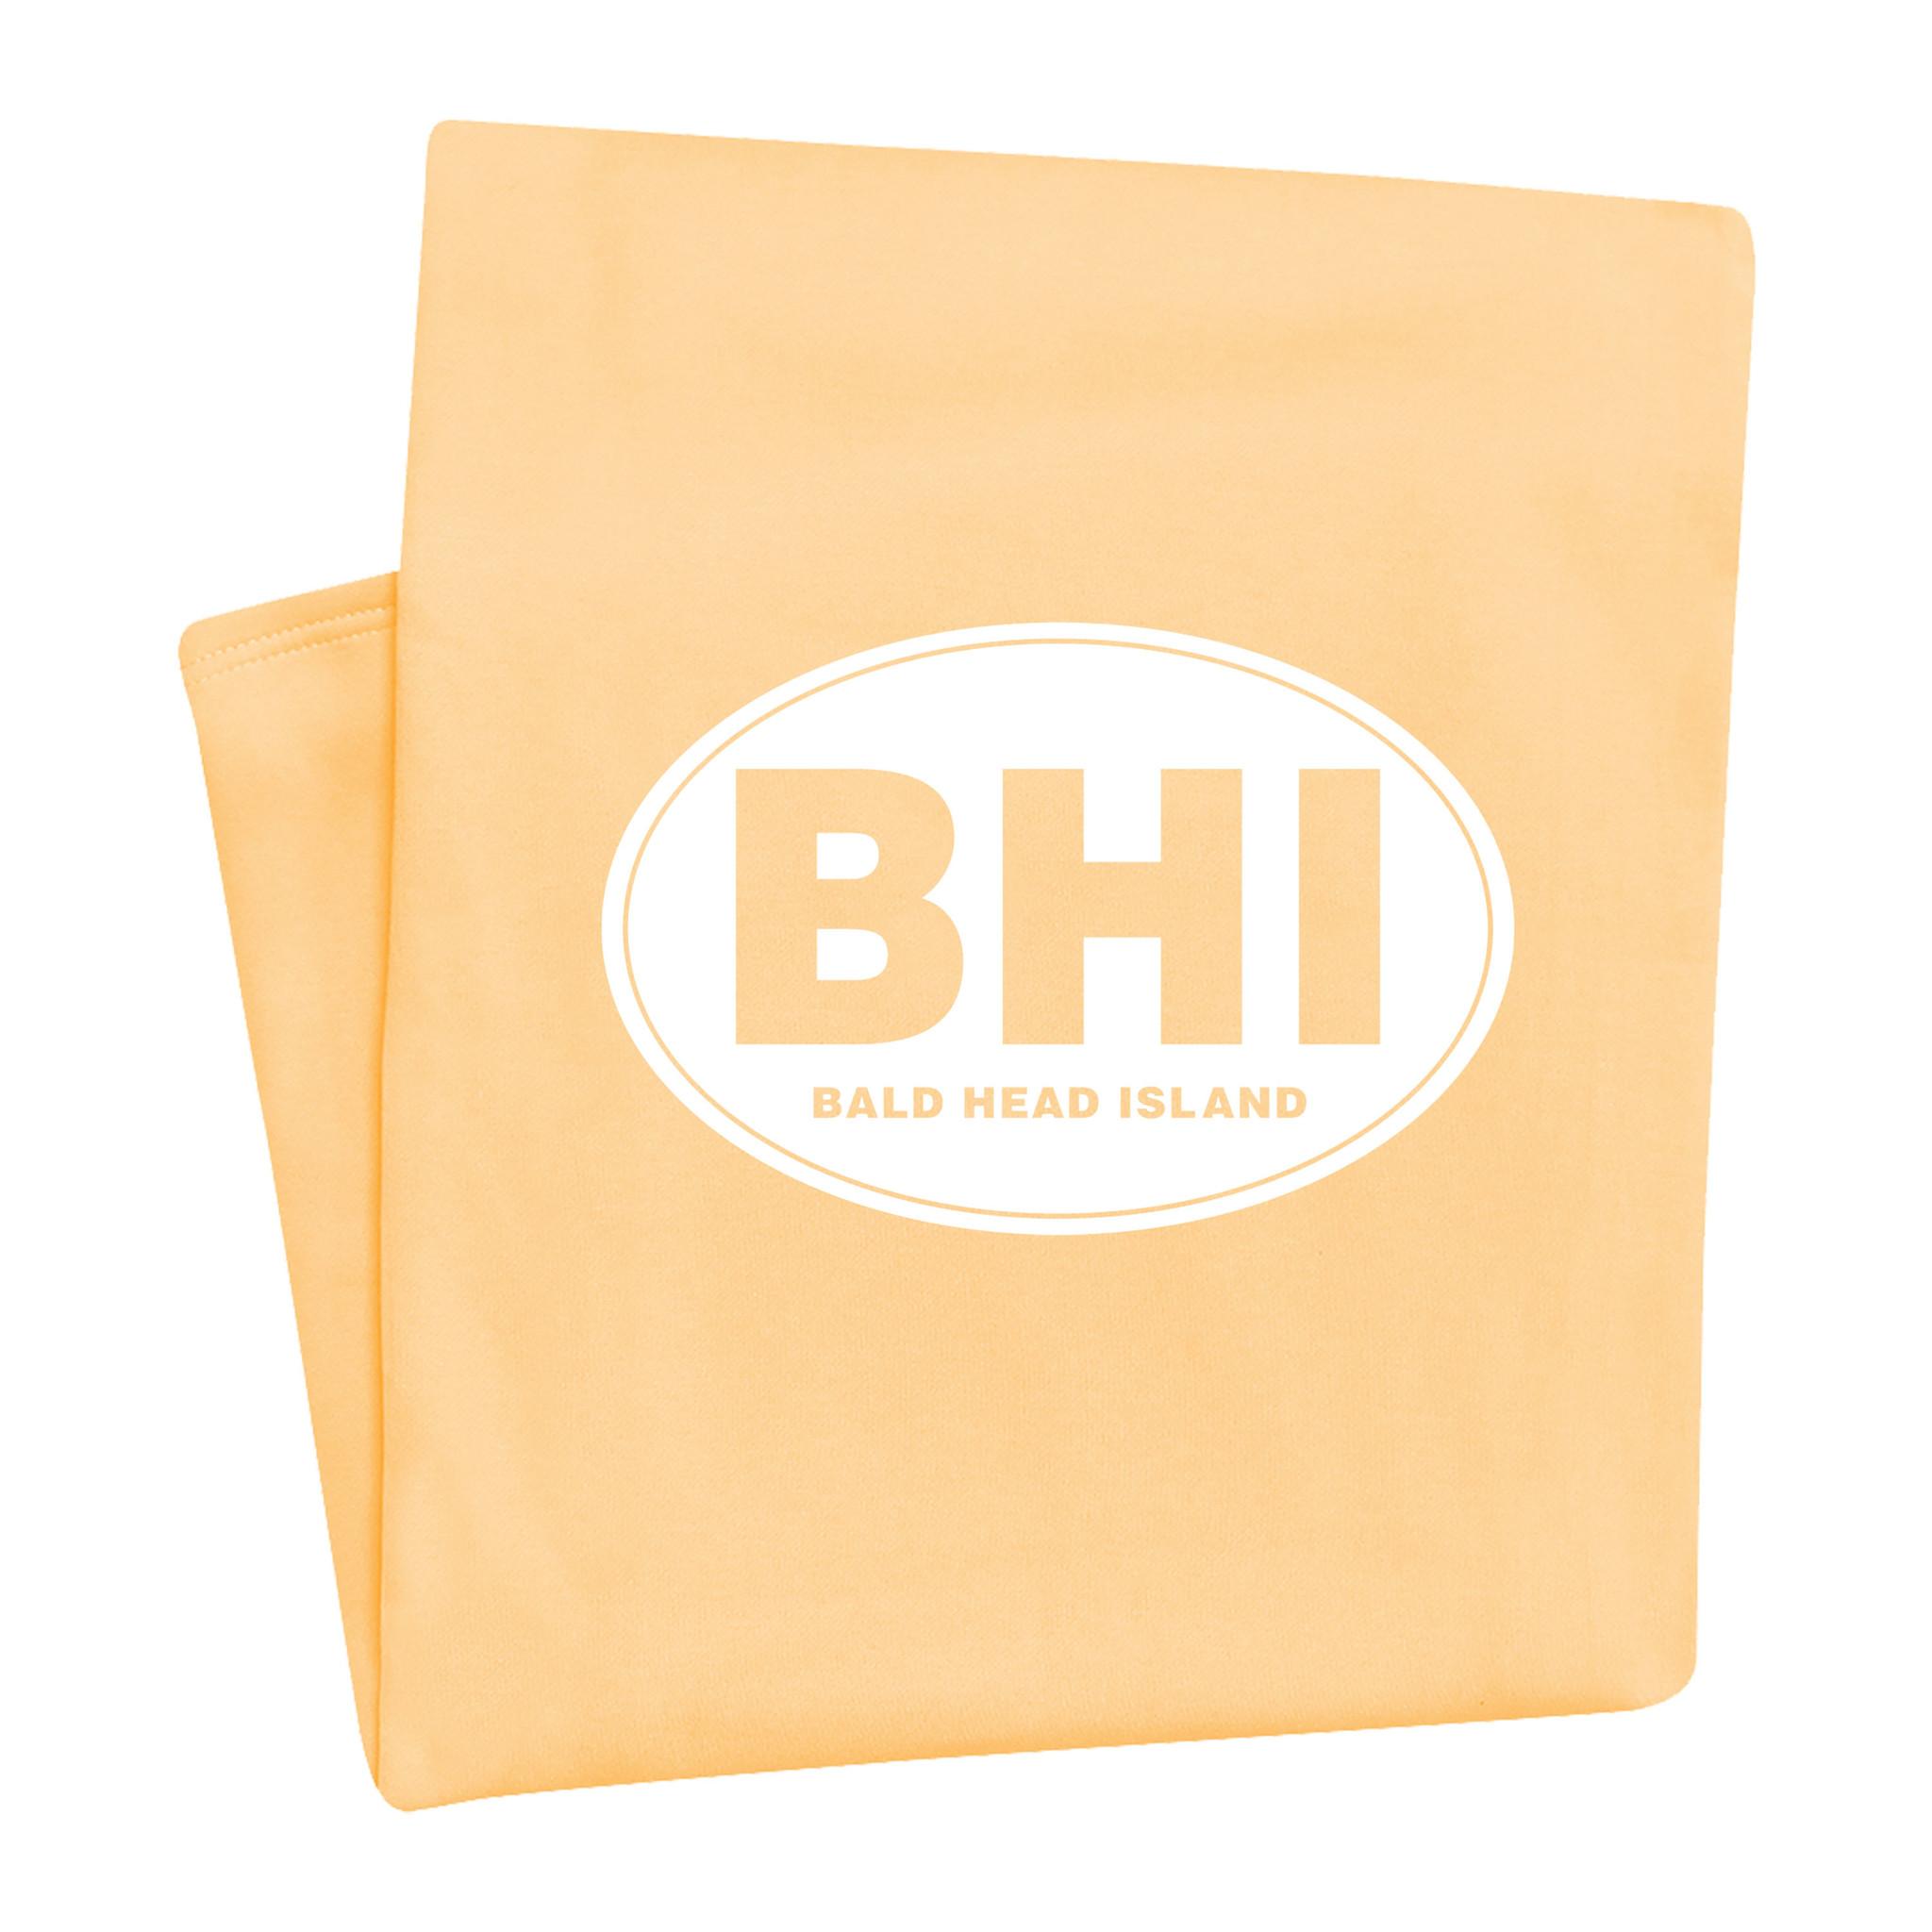 MV Sport BHI Sweatshirt Blanket